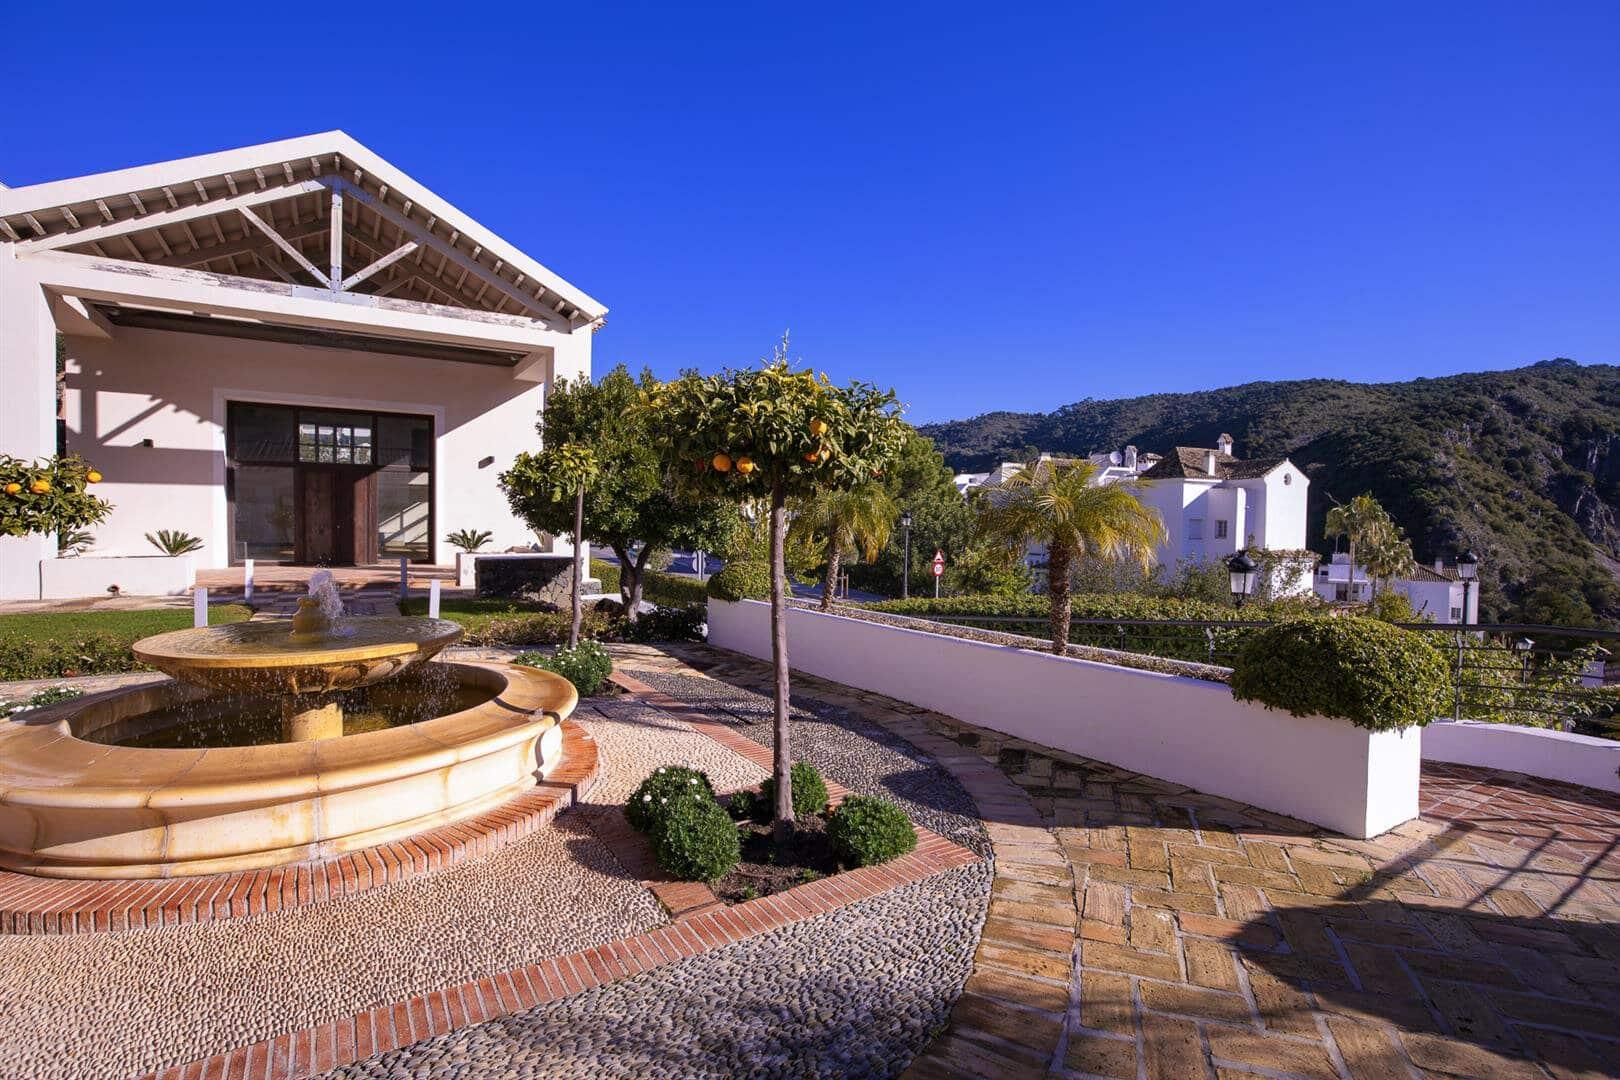 Spacious, modern and bright 3 bedroom townhouse in El Casar, Benahavis